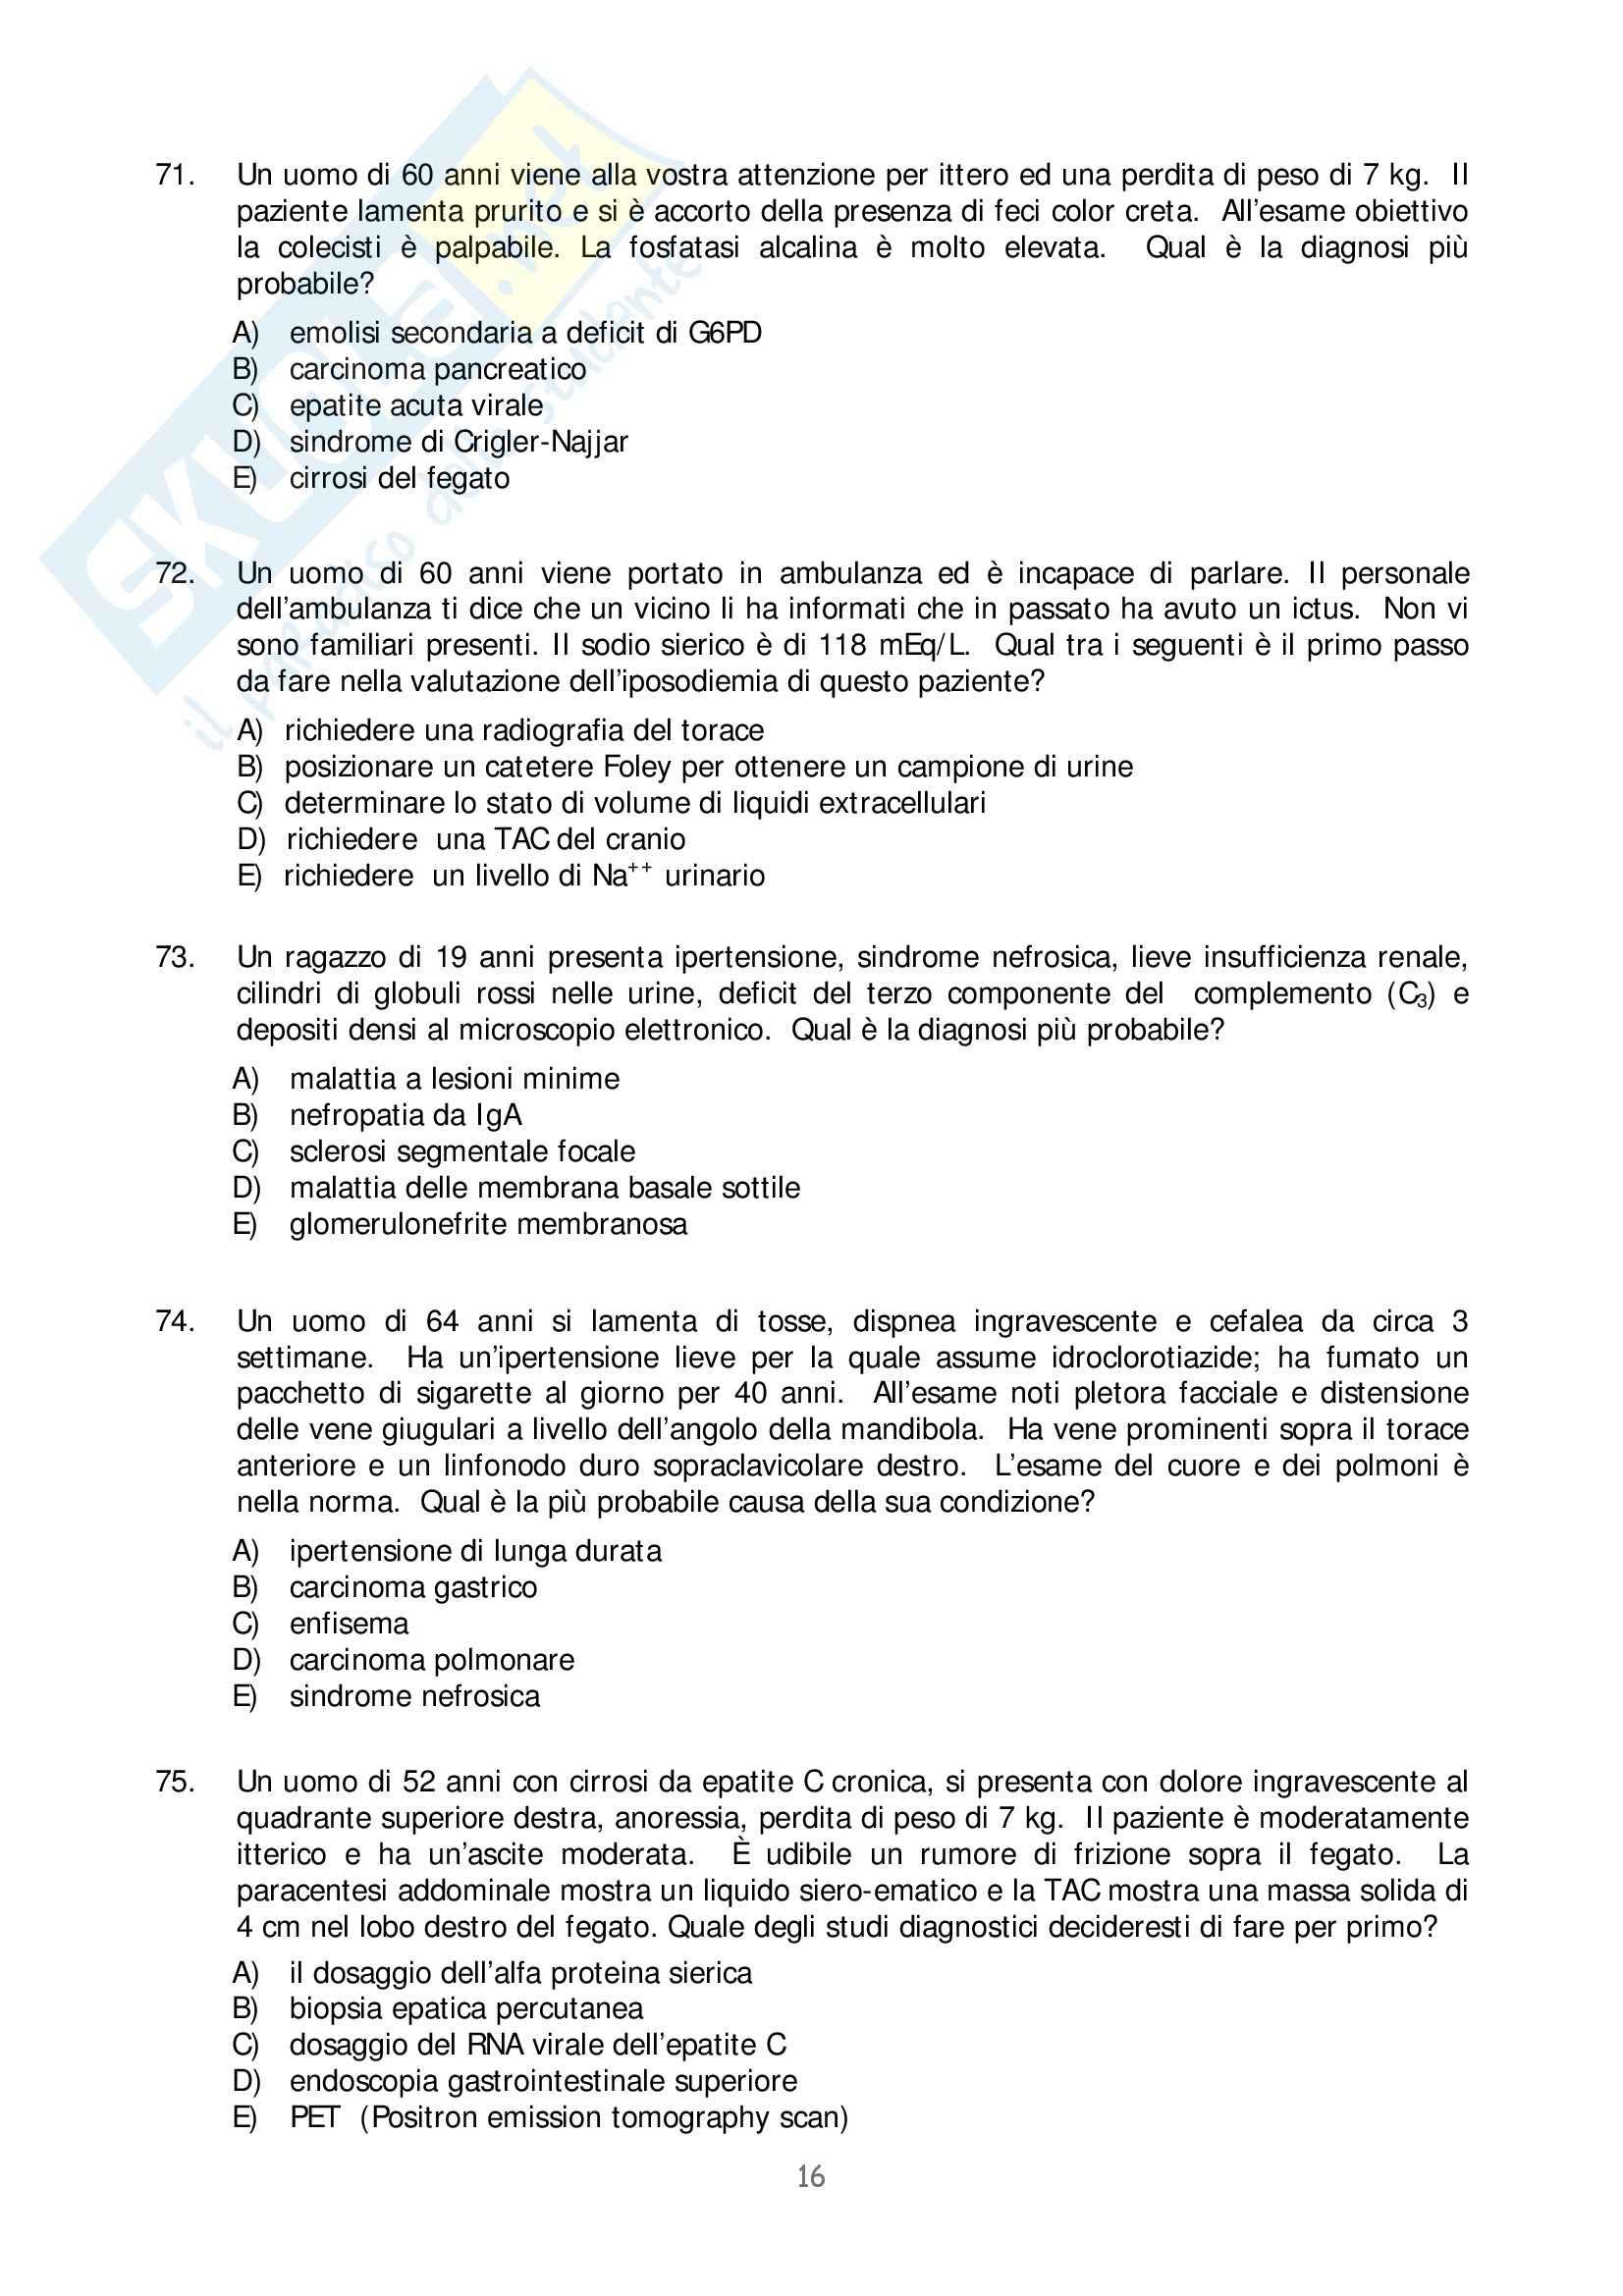 Medicina interna - test prima parte Pag. 16